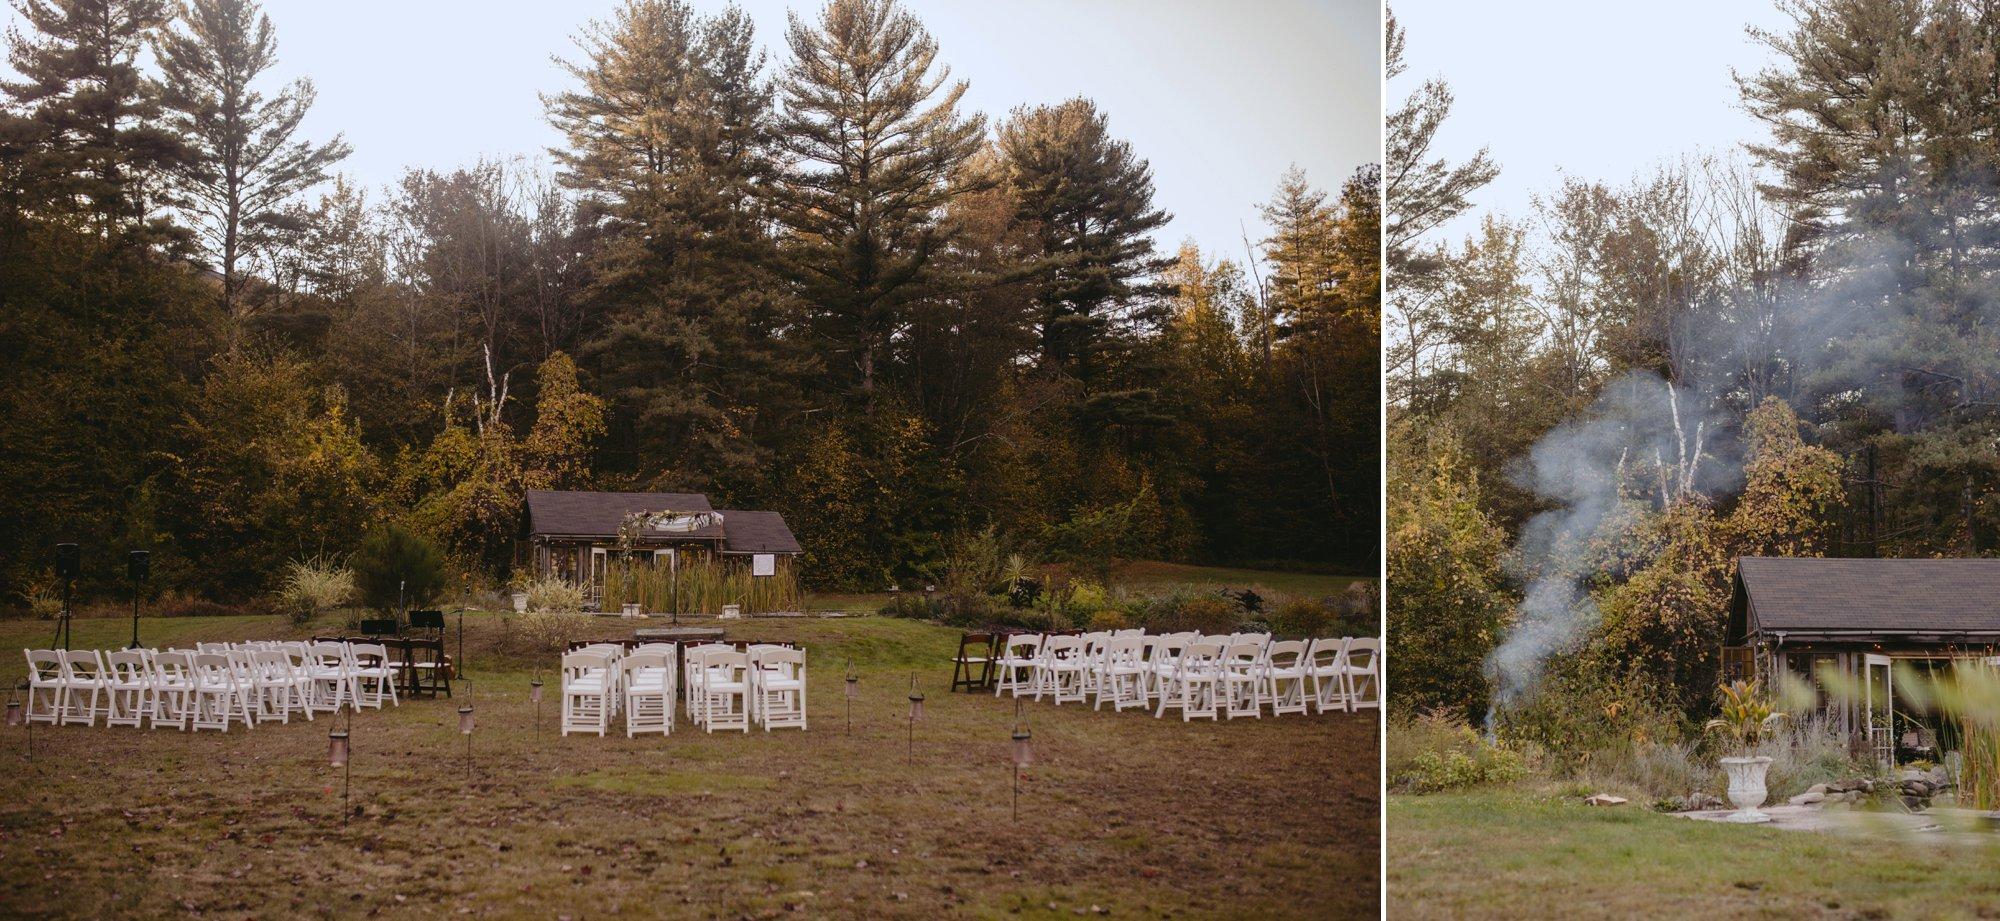 october foxfire mountain house wedding upstate new york. Ceremony site.